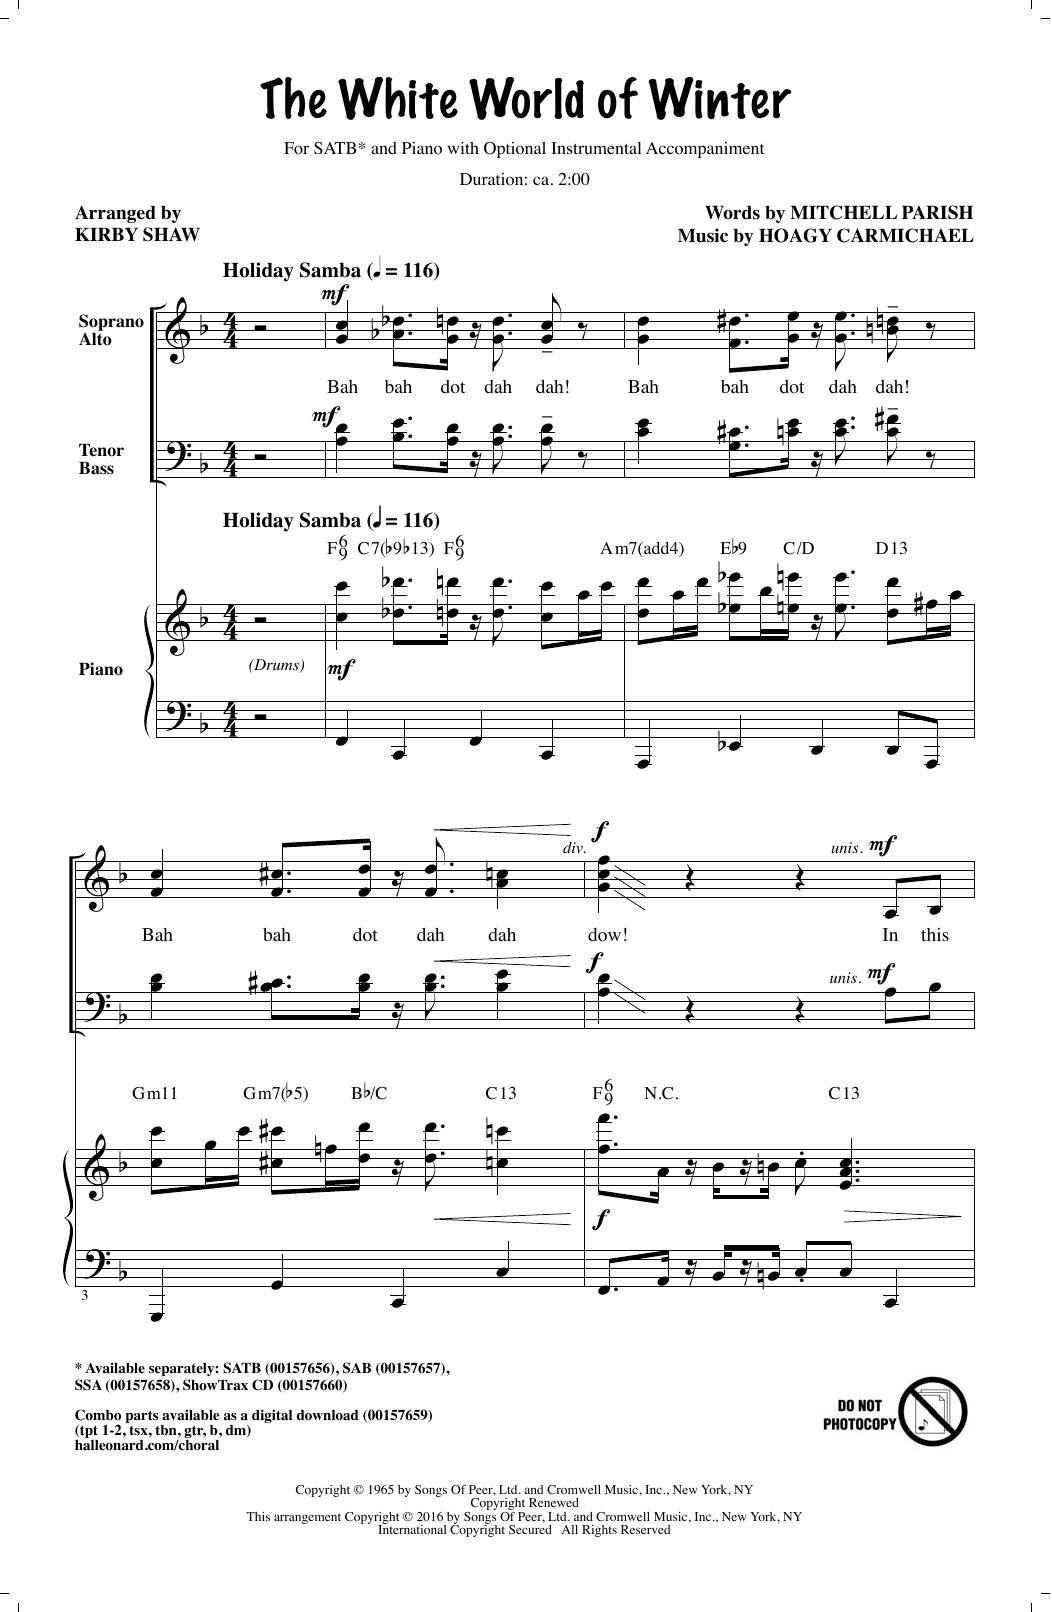 The White World Of Winter (SATB Choir)